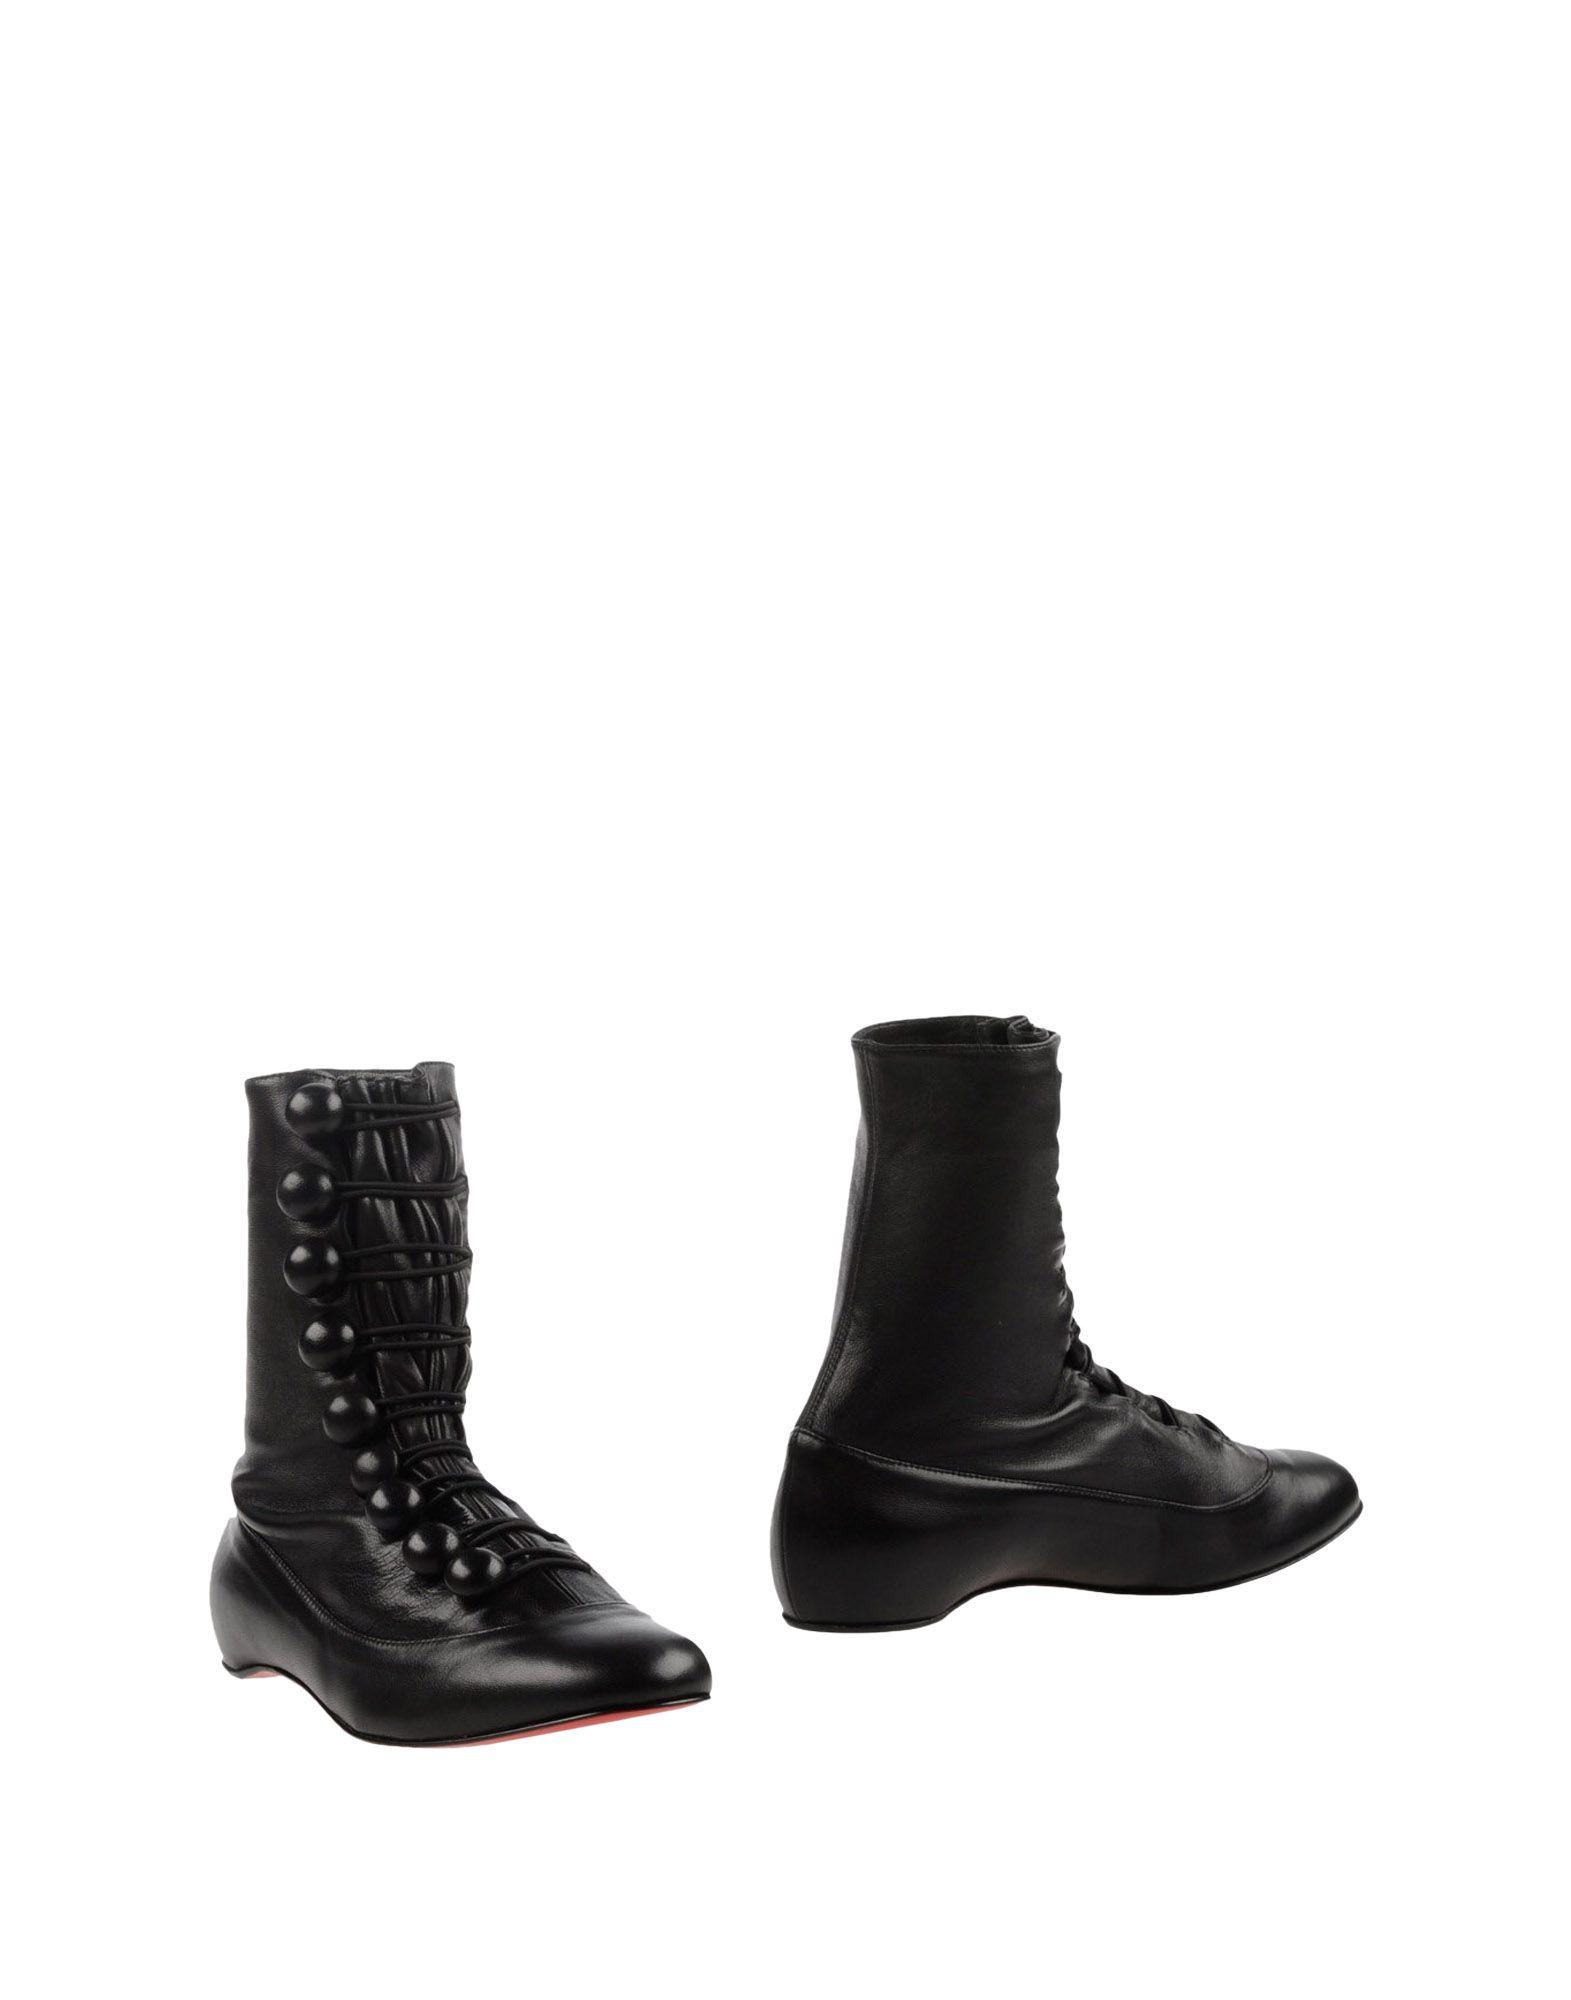 christian louboutin mid-calf wedge boots